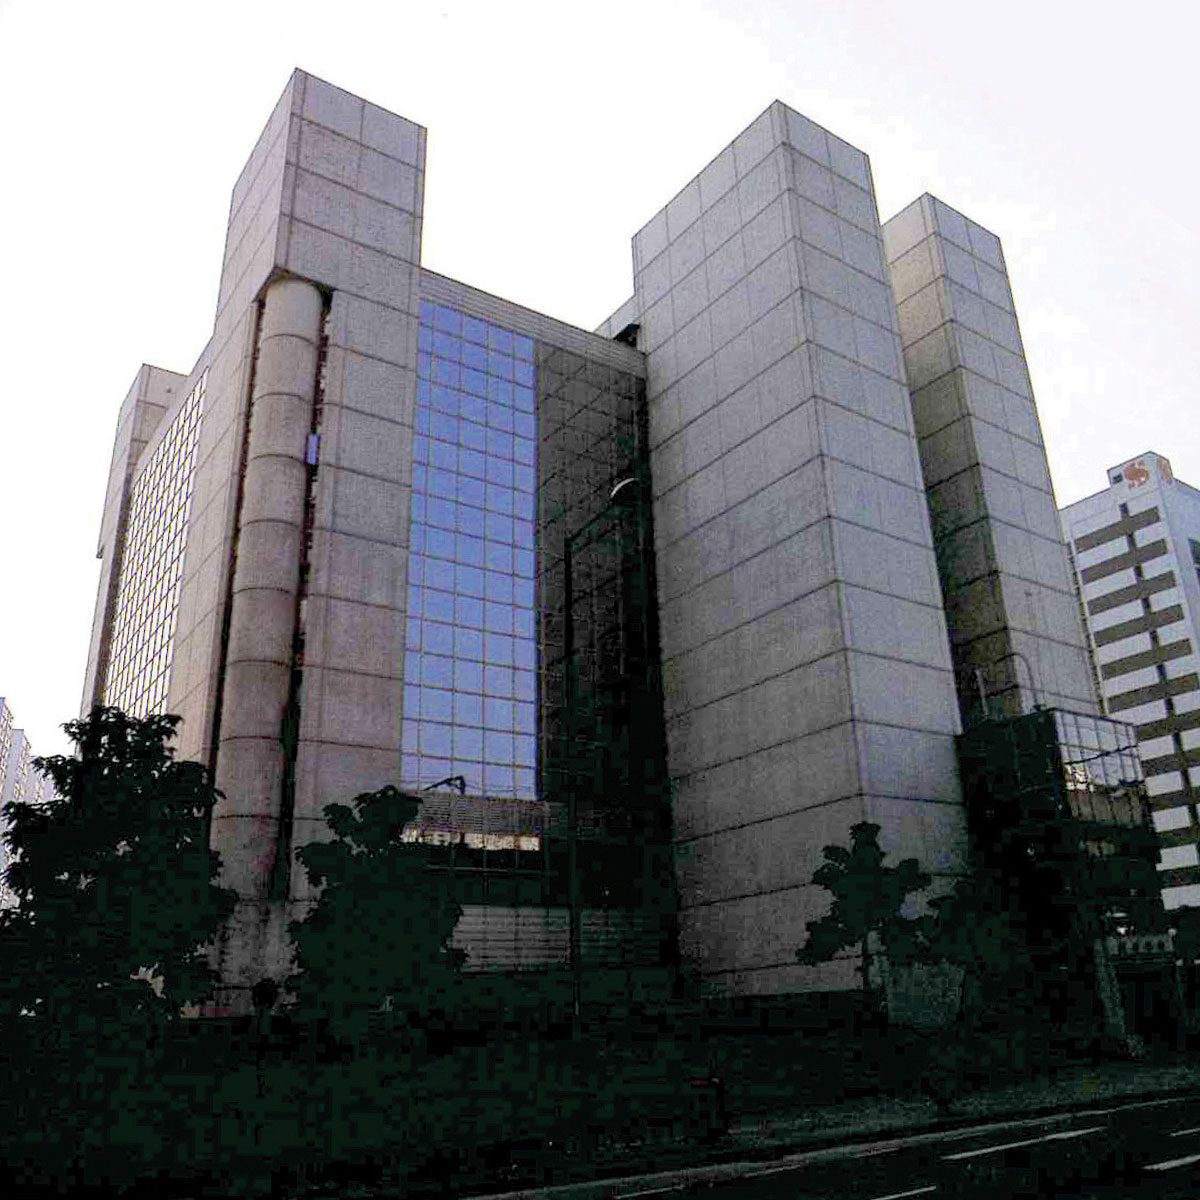 Kwun Tong Law Courts at 10 Lei Yue Mun Road, Kowloon